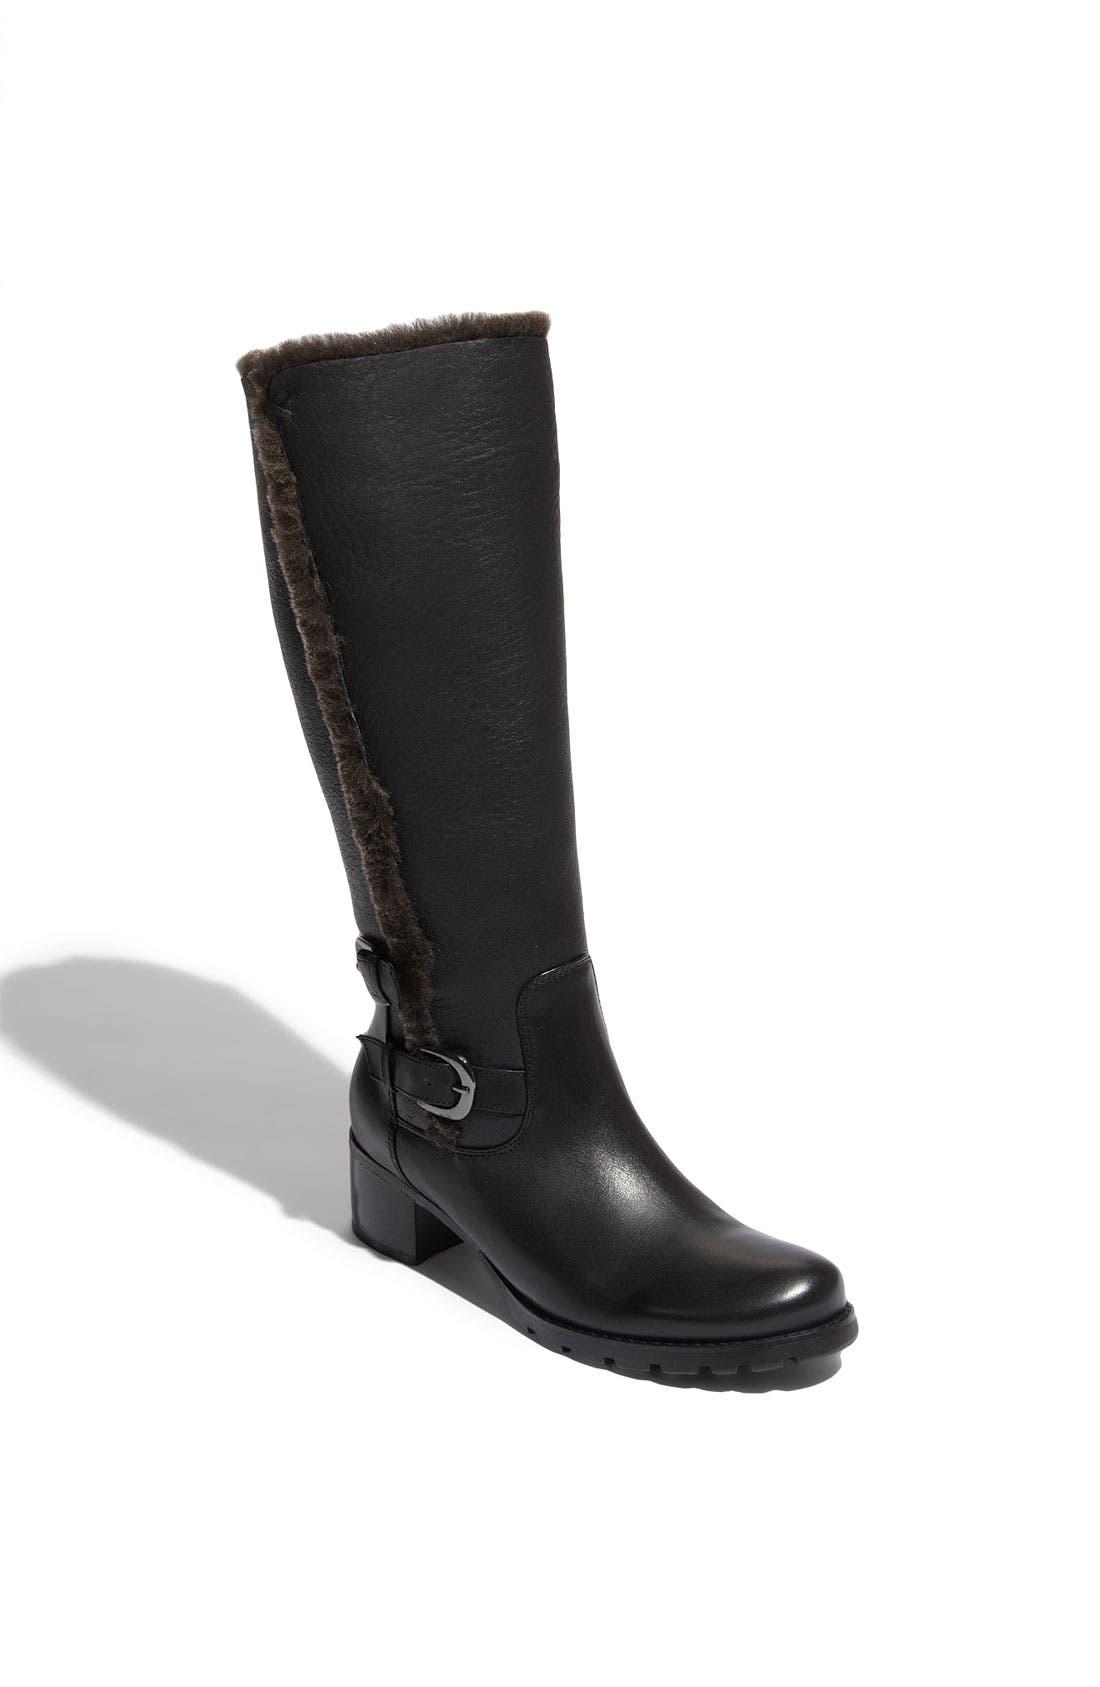 Alternate Image 1 Selected - Blondo 'Fatima' Waterproof Boot